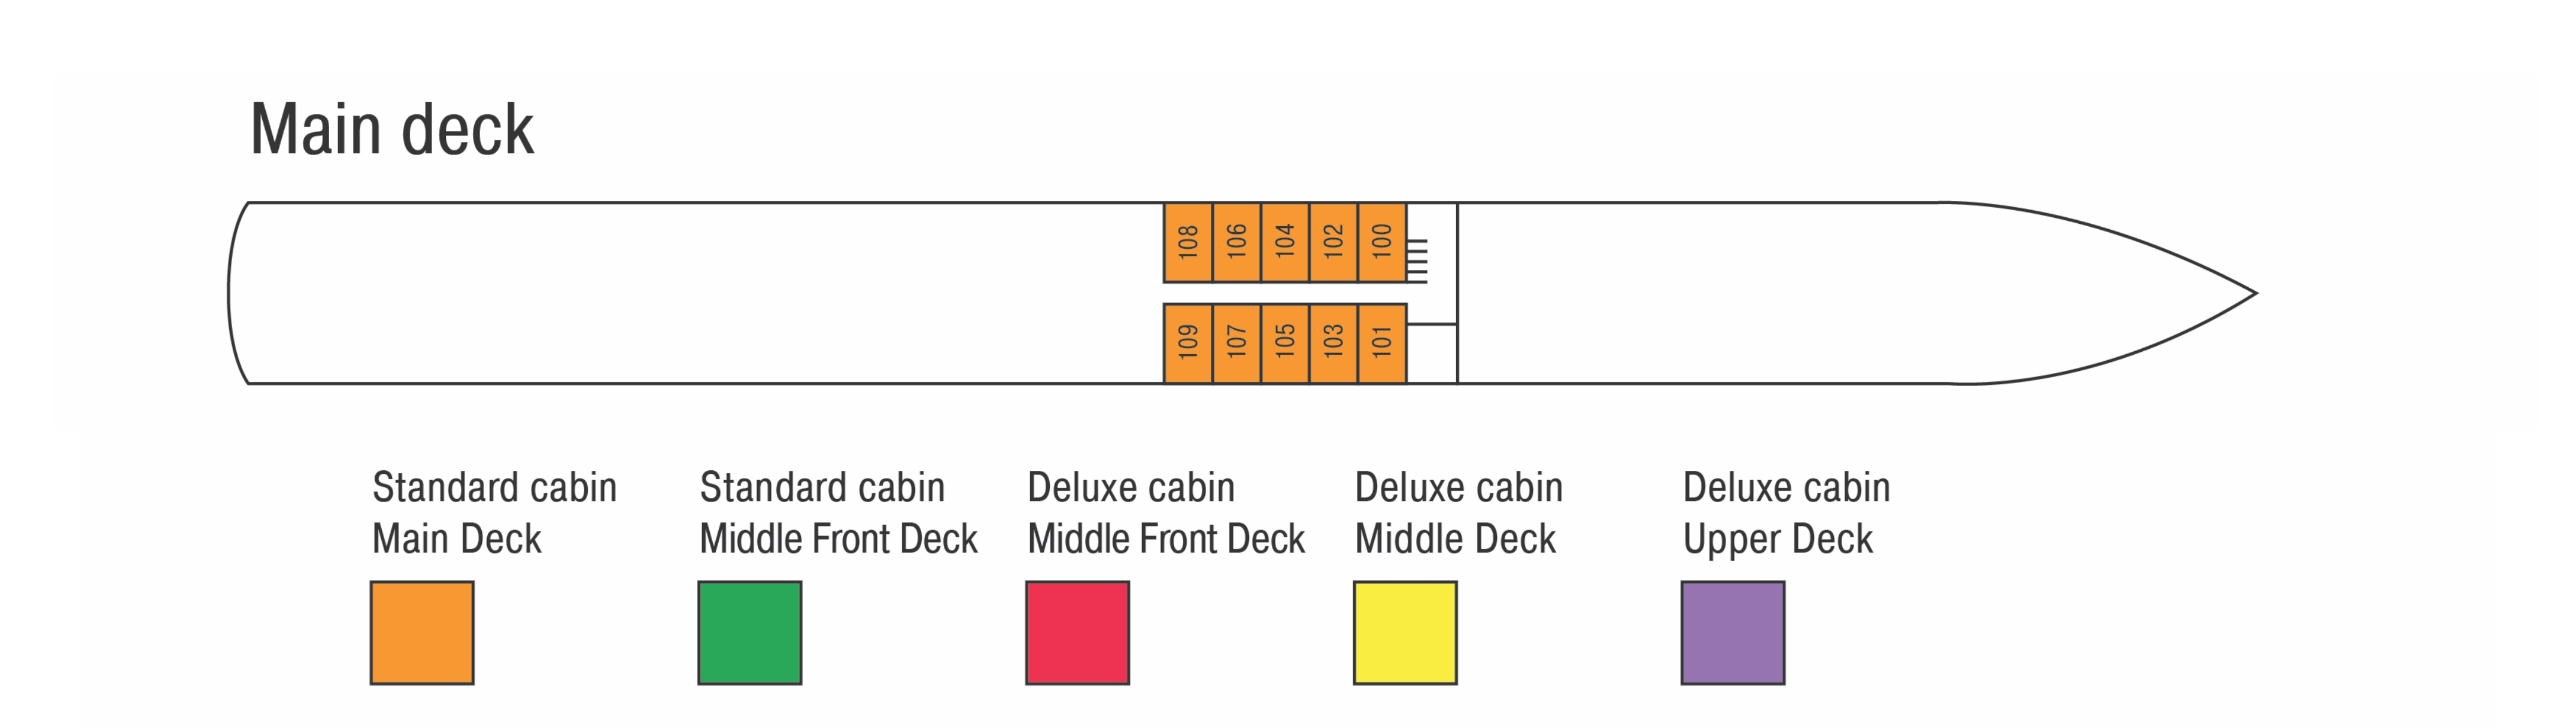 MS Crucestar, Main Deck